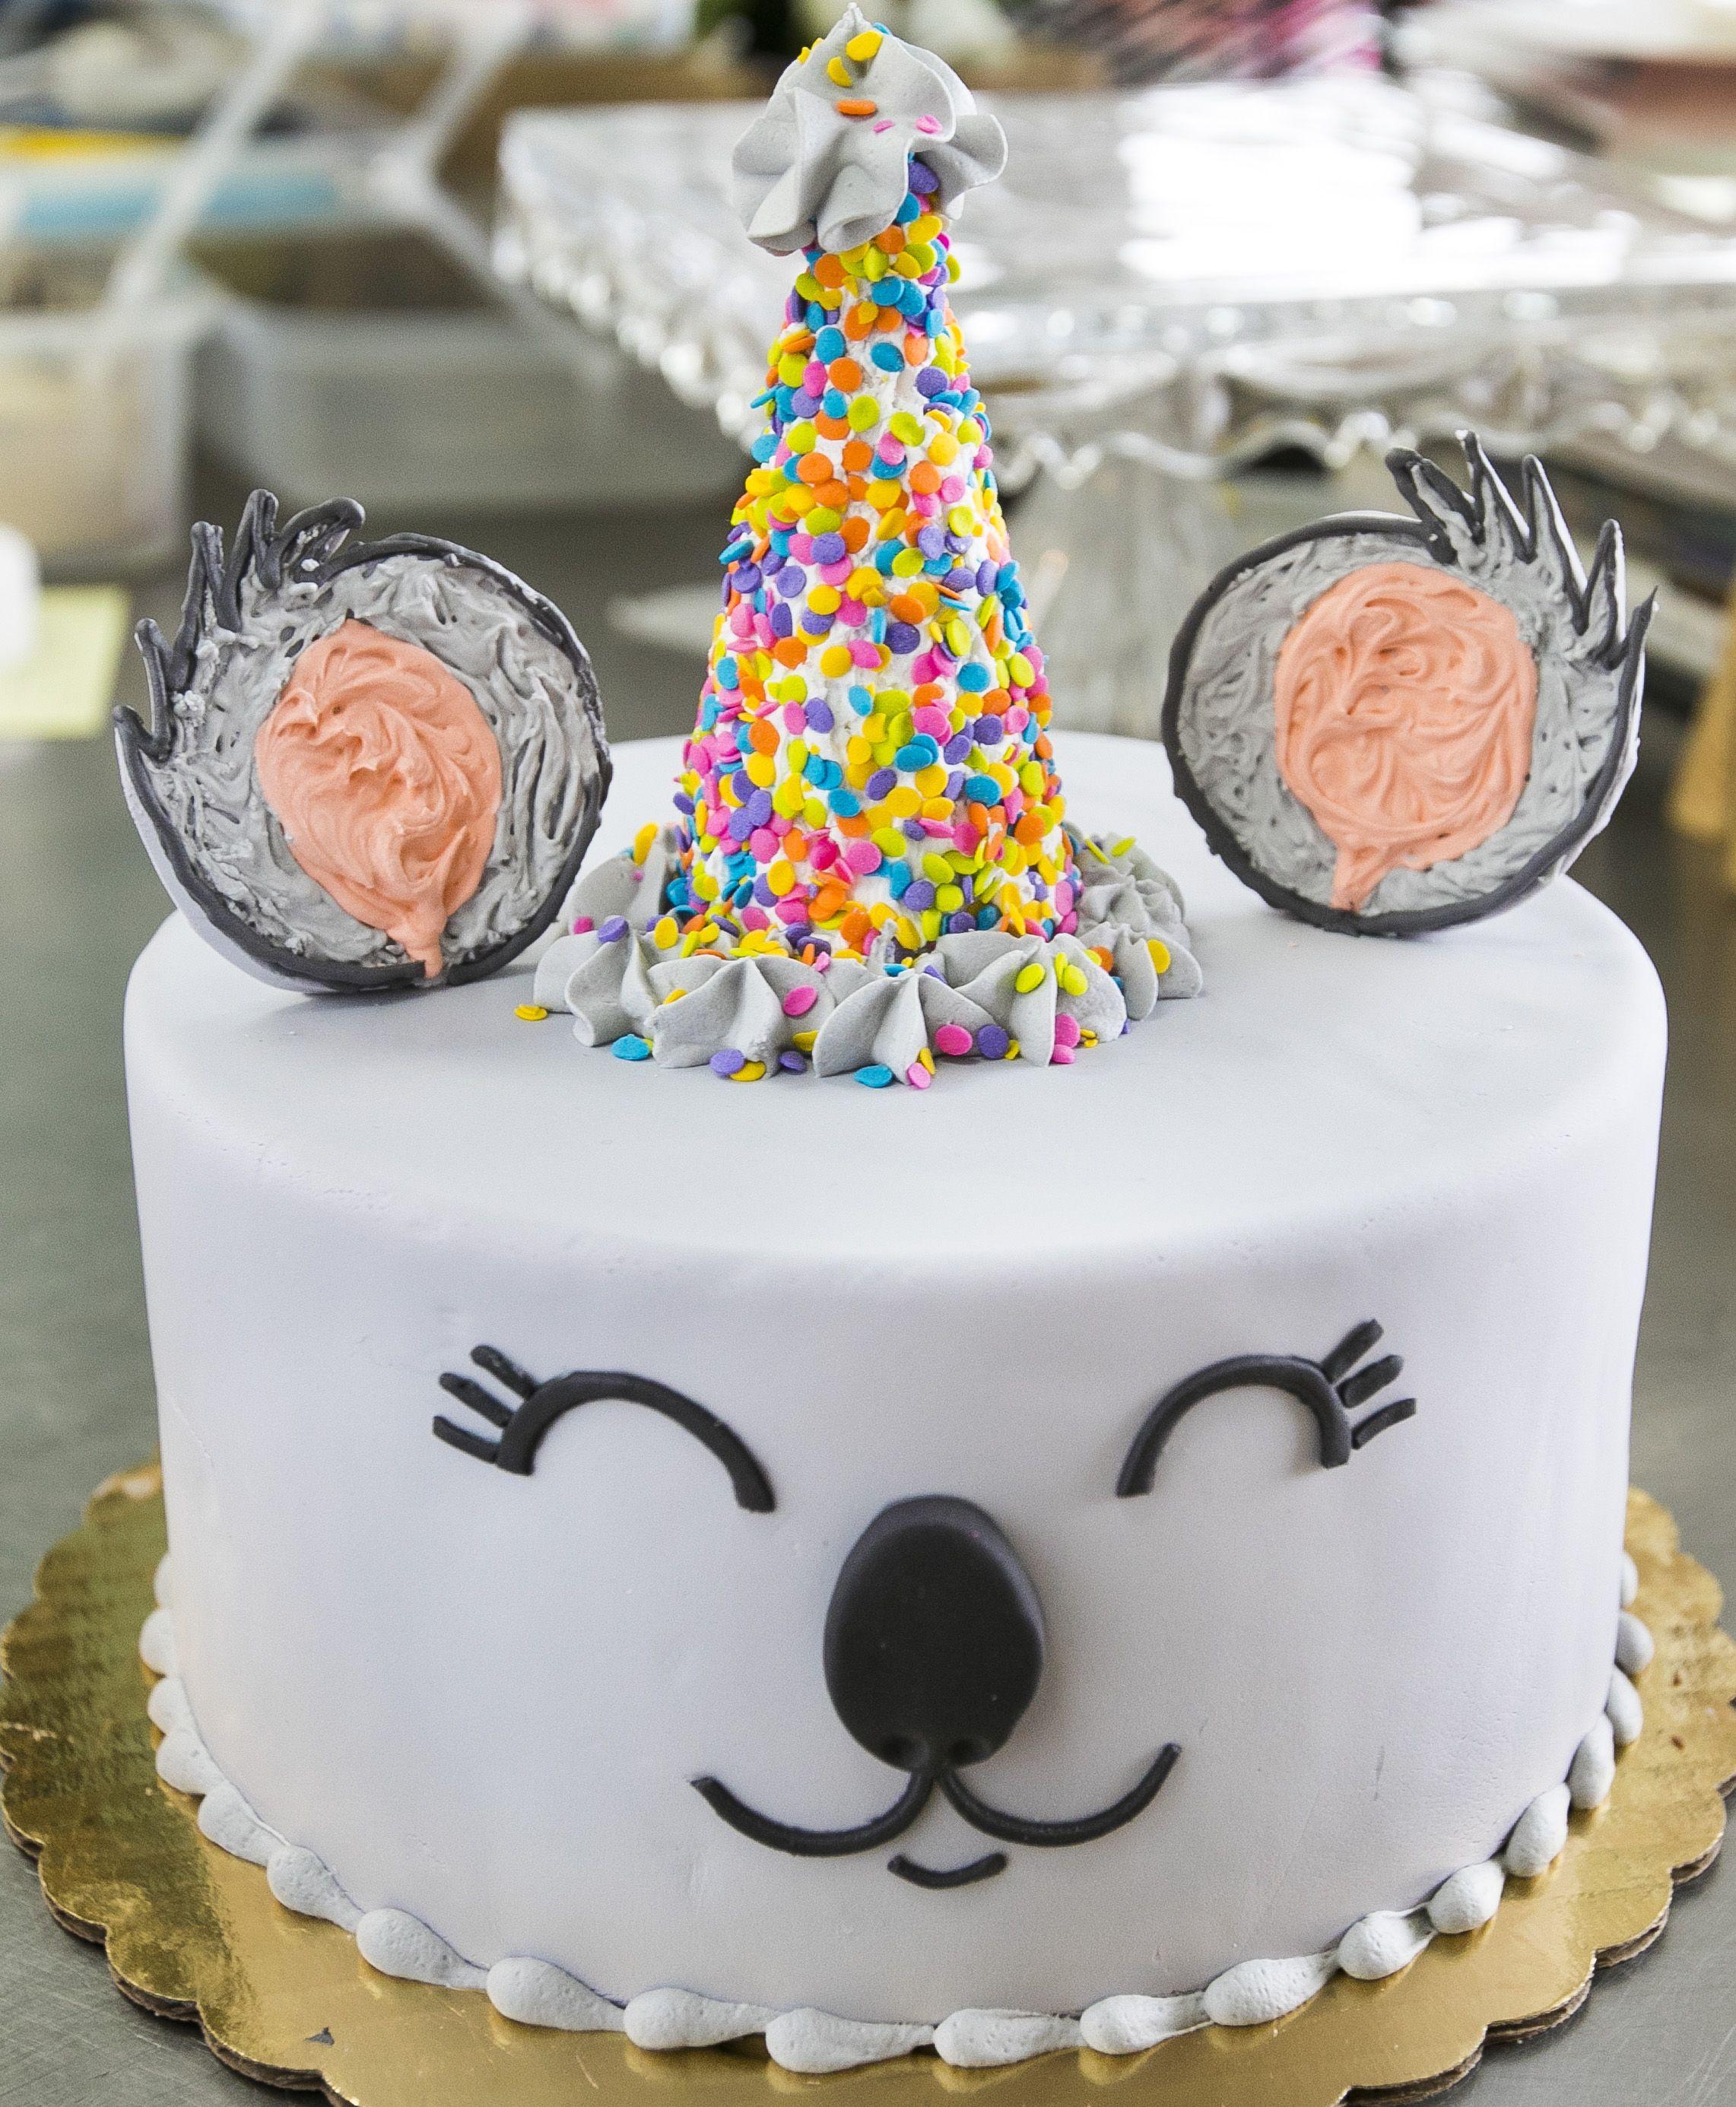 Koala Bear Birthday Cake In 2020 Cool Cake Designs Cake Designs Birthday Cake Design